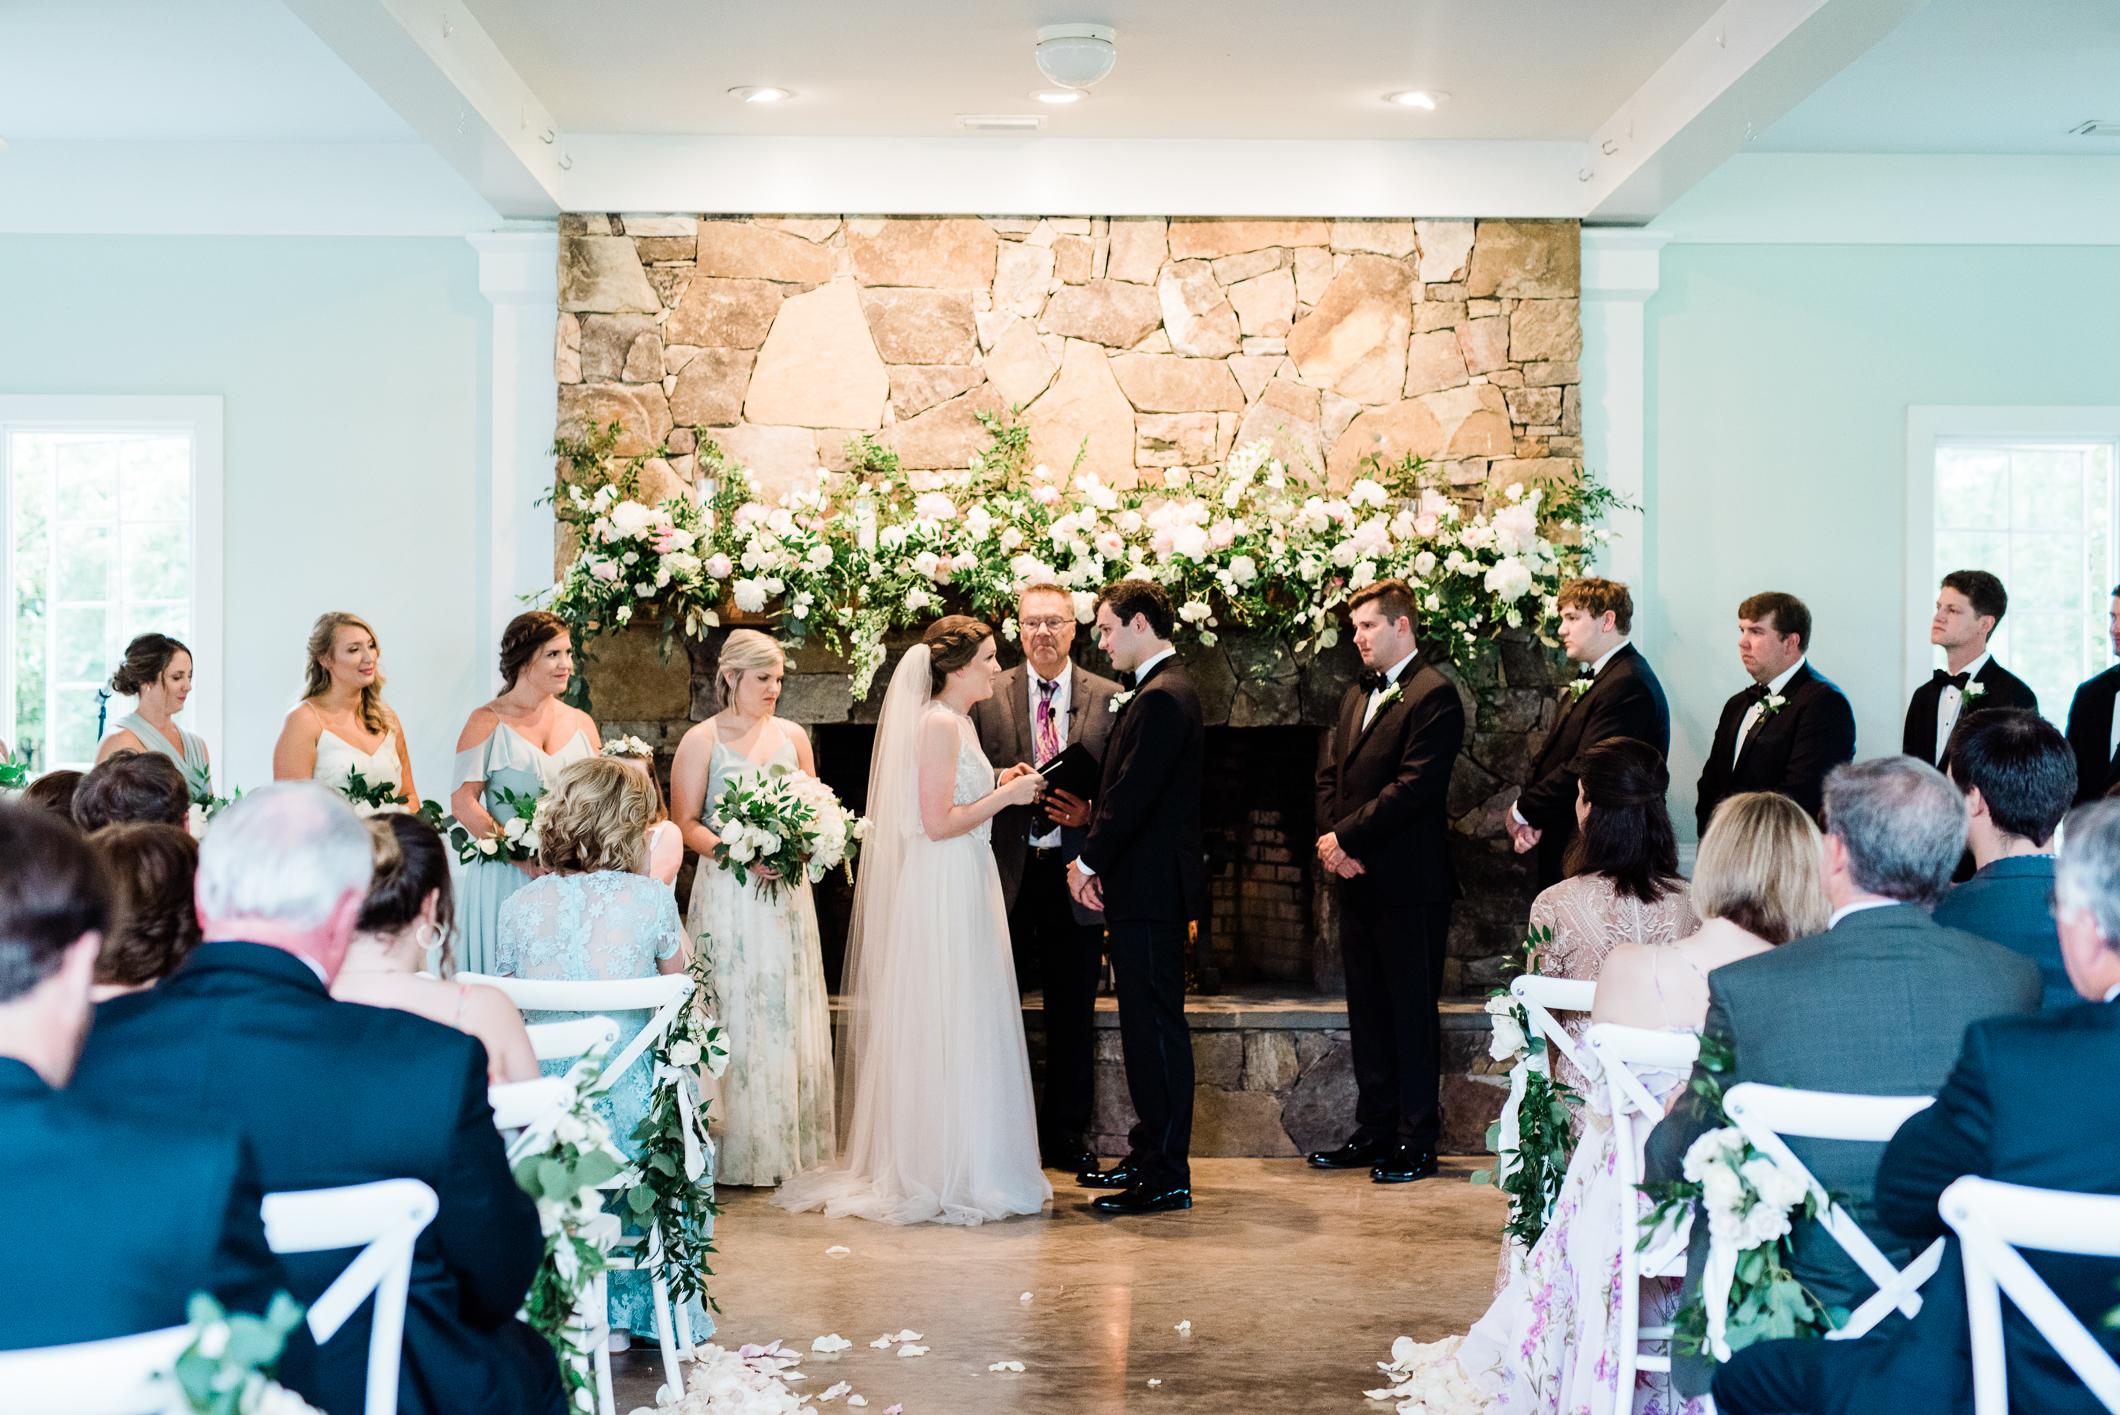 Wedding Vows Ceremony Photography.jpg